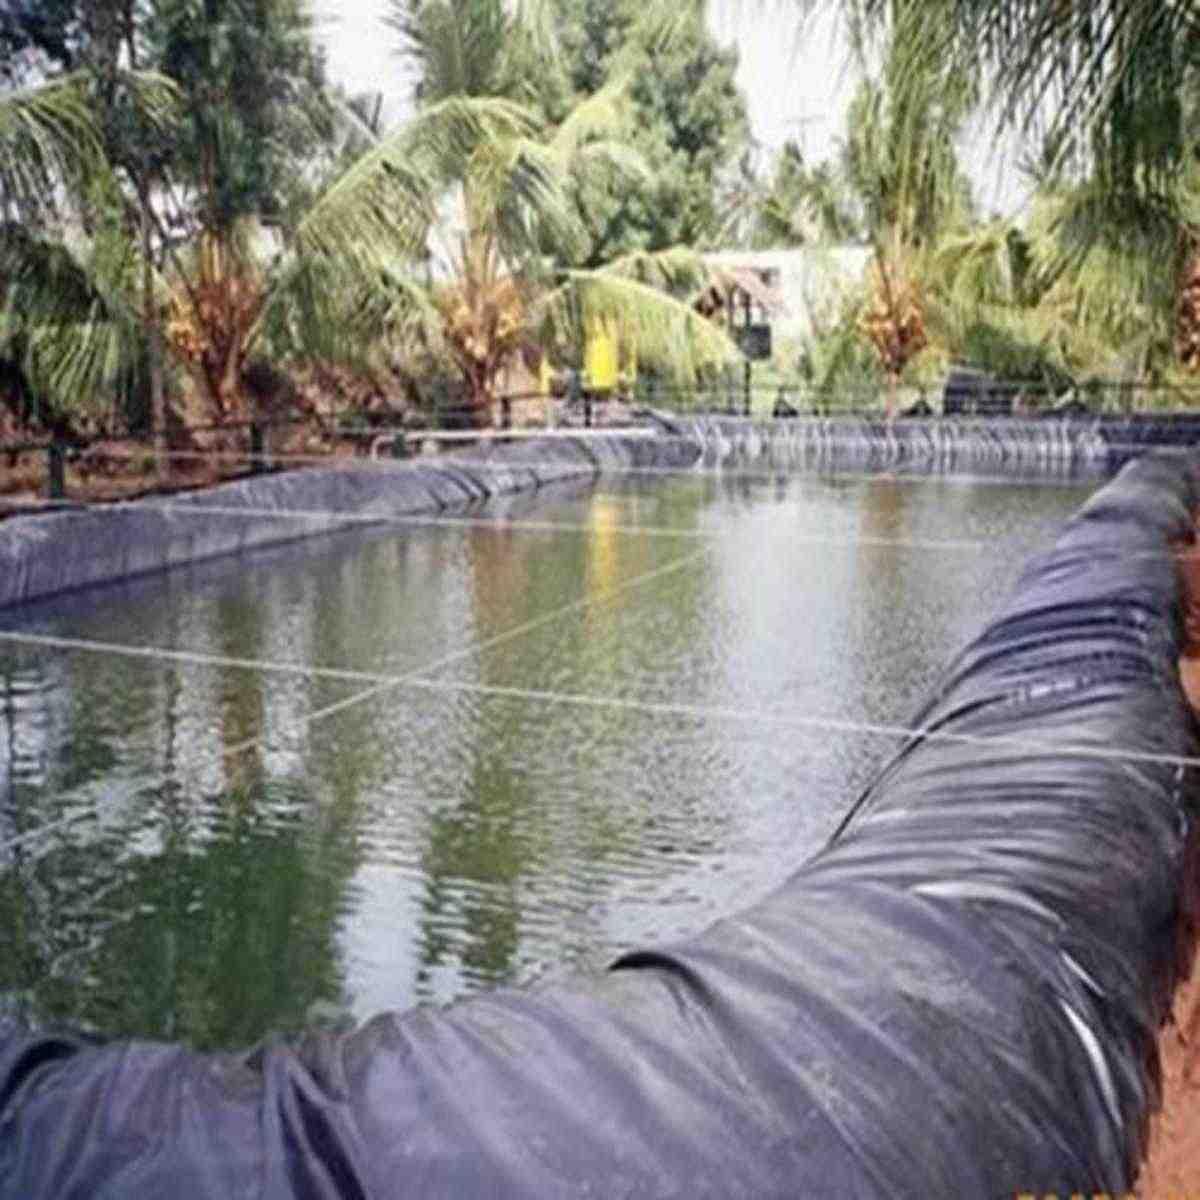 10x4 m בריכת הדגים ליינר בד בית גן בריכת מחוזק HDPE כבד גינון בריכת בריכה עמיד למים אוניית בד שחור חדש